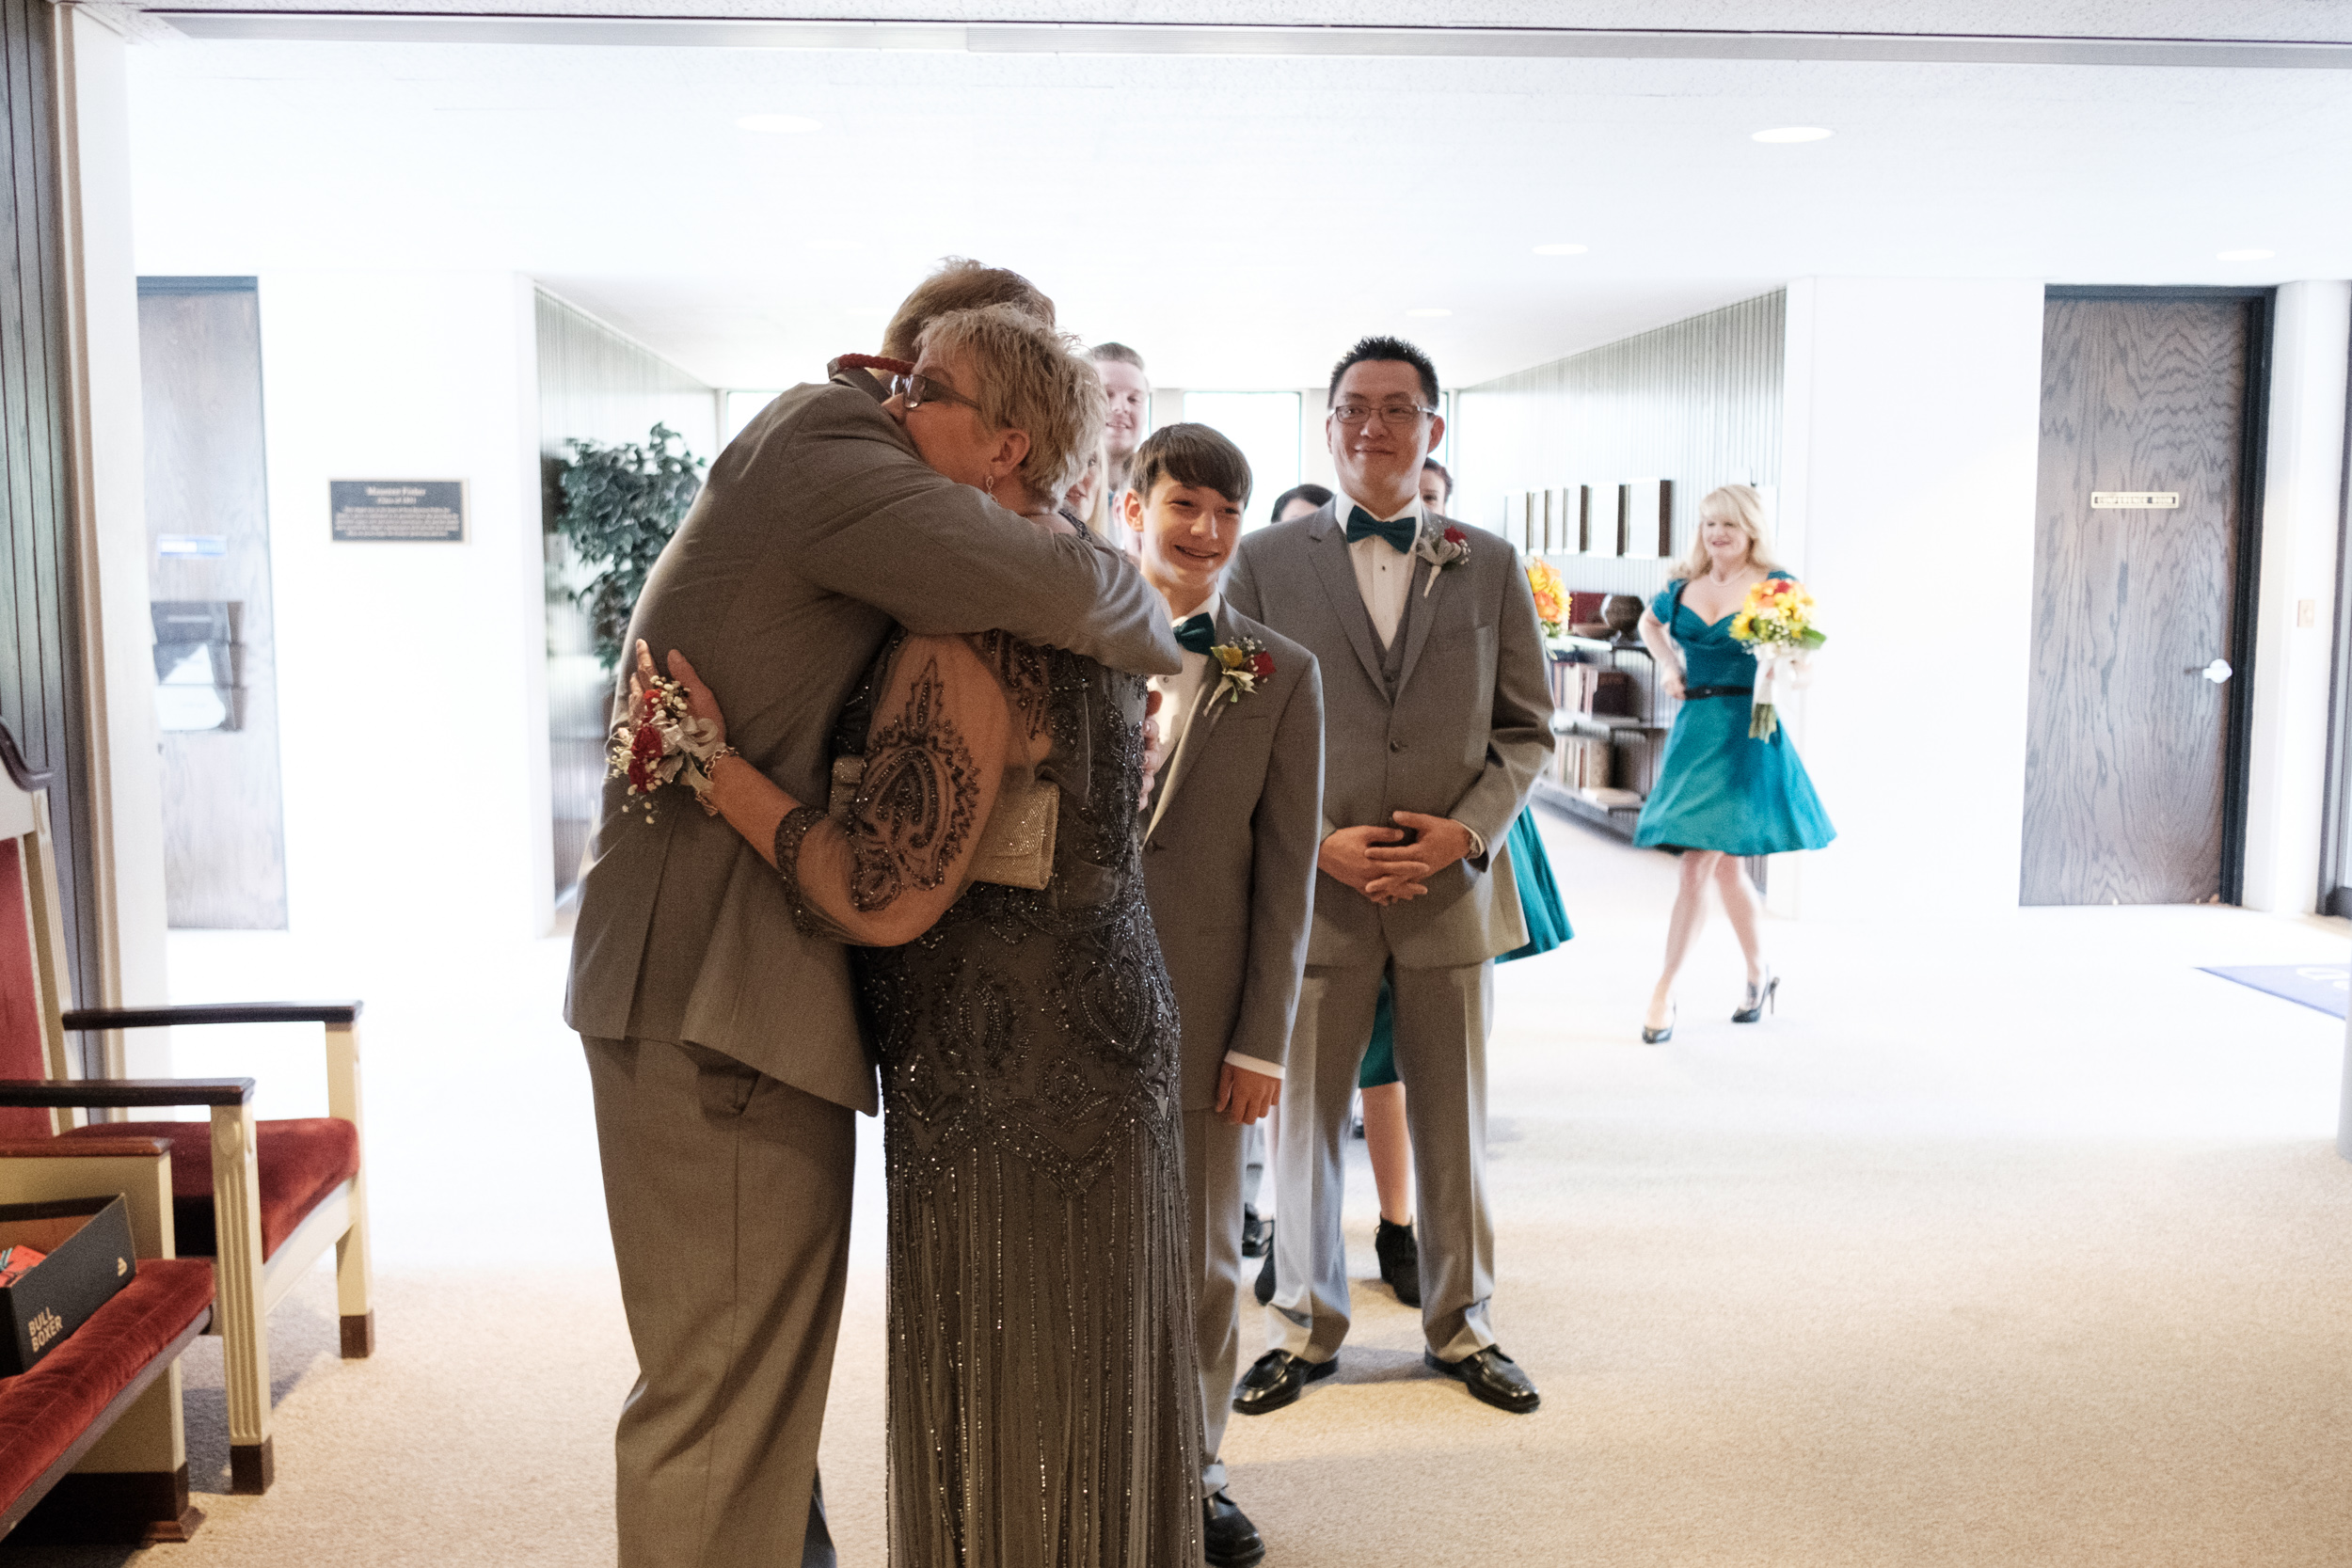 Christian & Sarah wedding photography by Brian milo-149.jpg